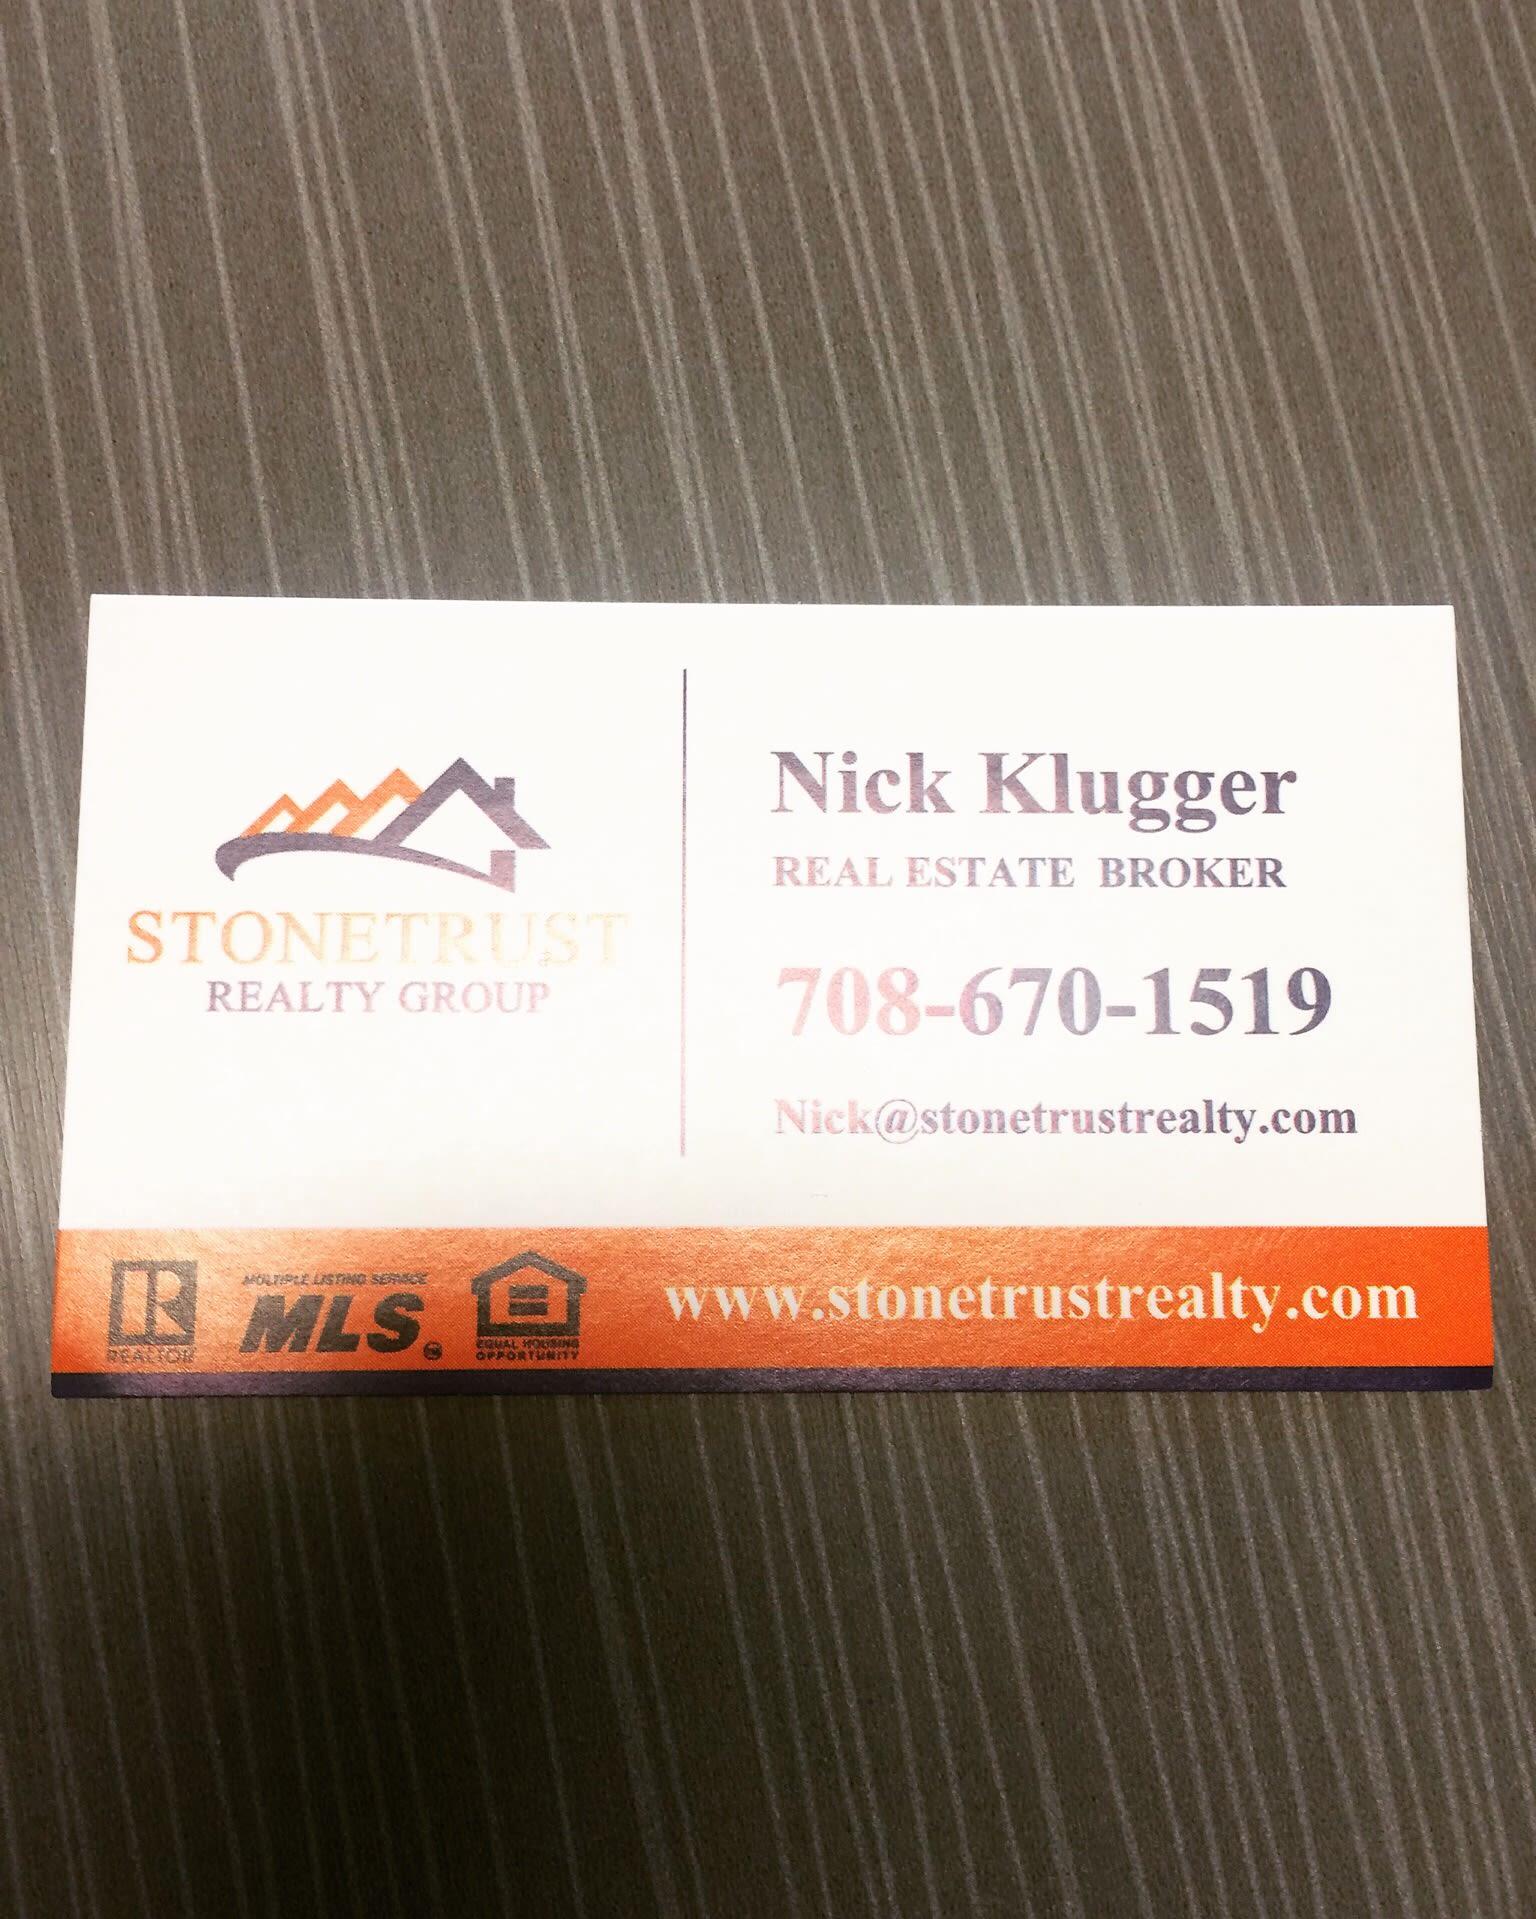 Nick Klugger